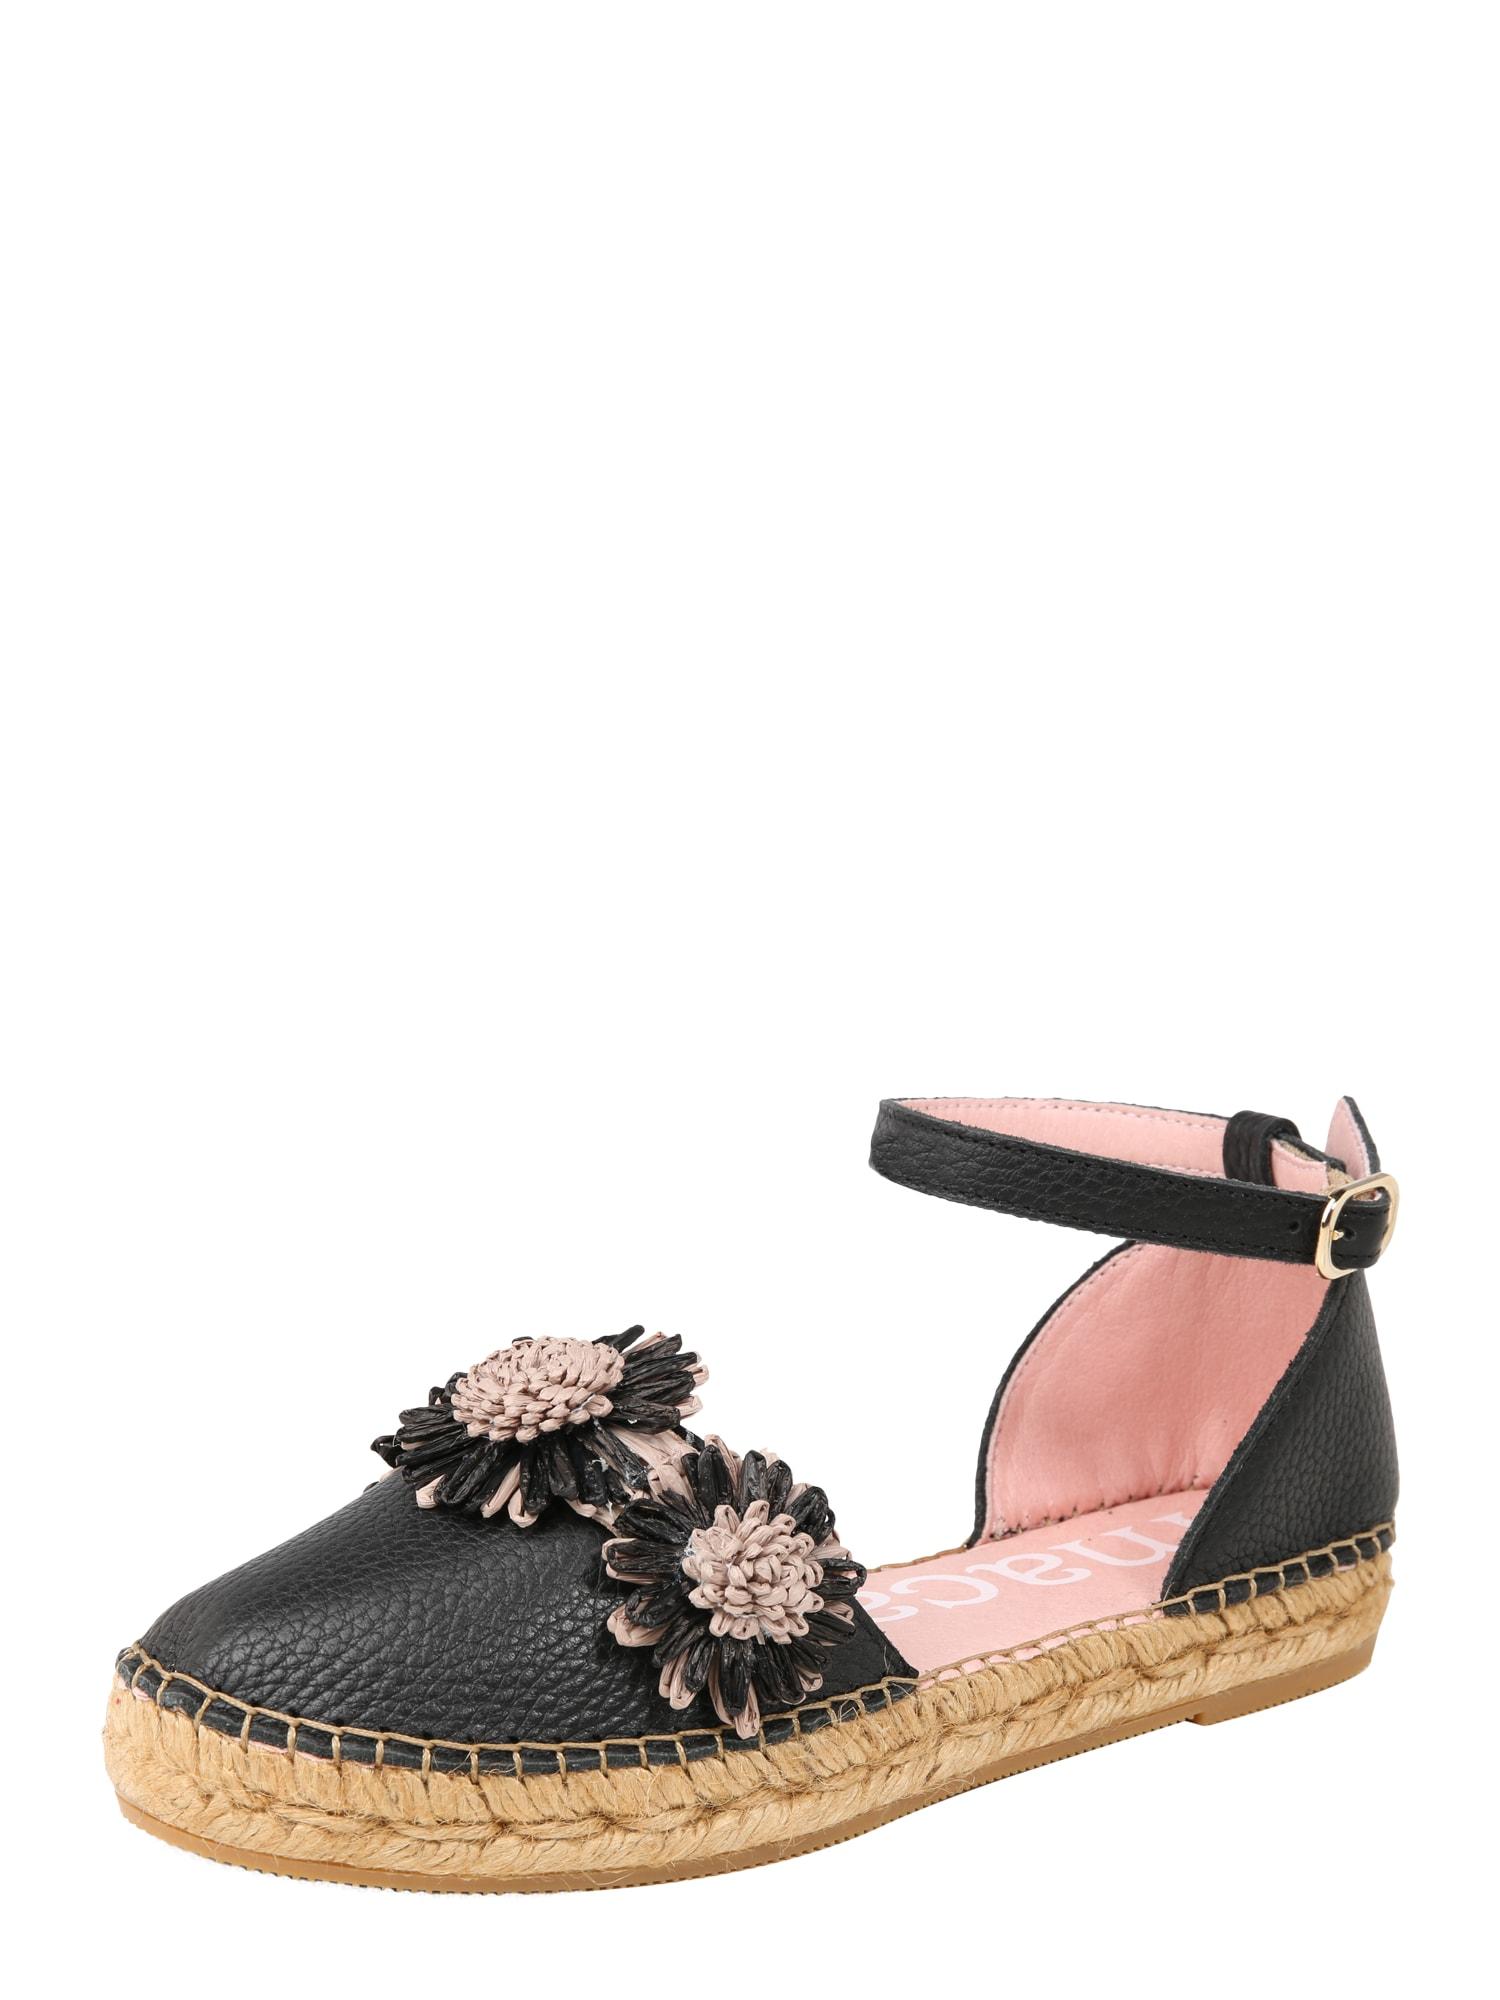 Sandály MAR 51 béžová černá MACARENA